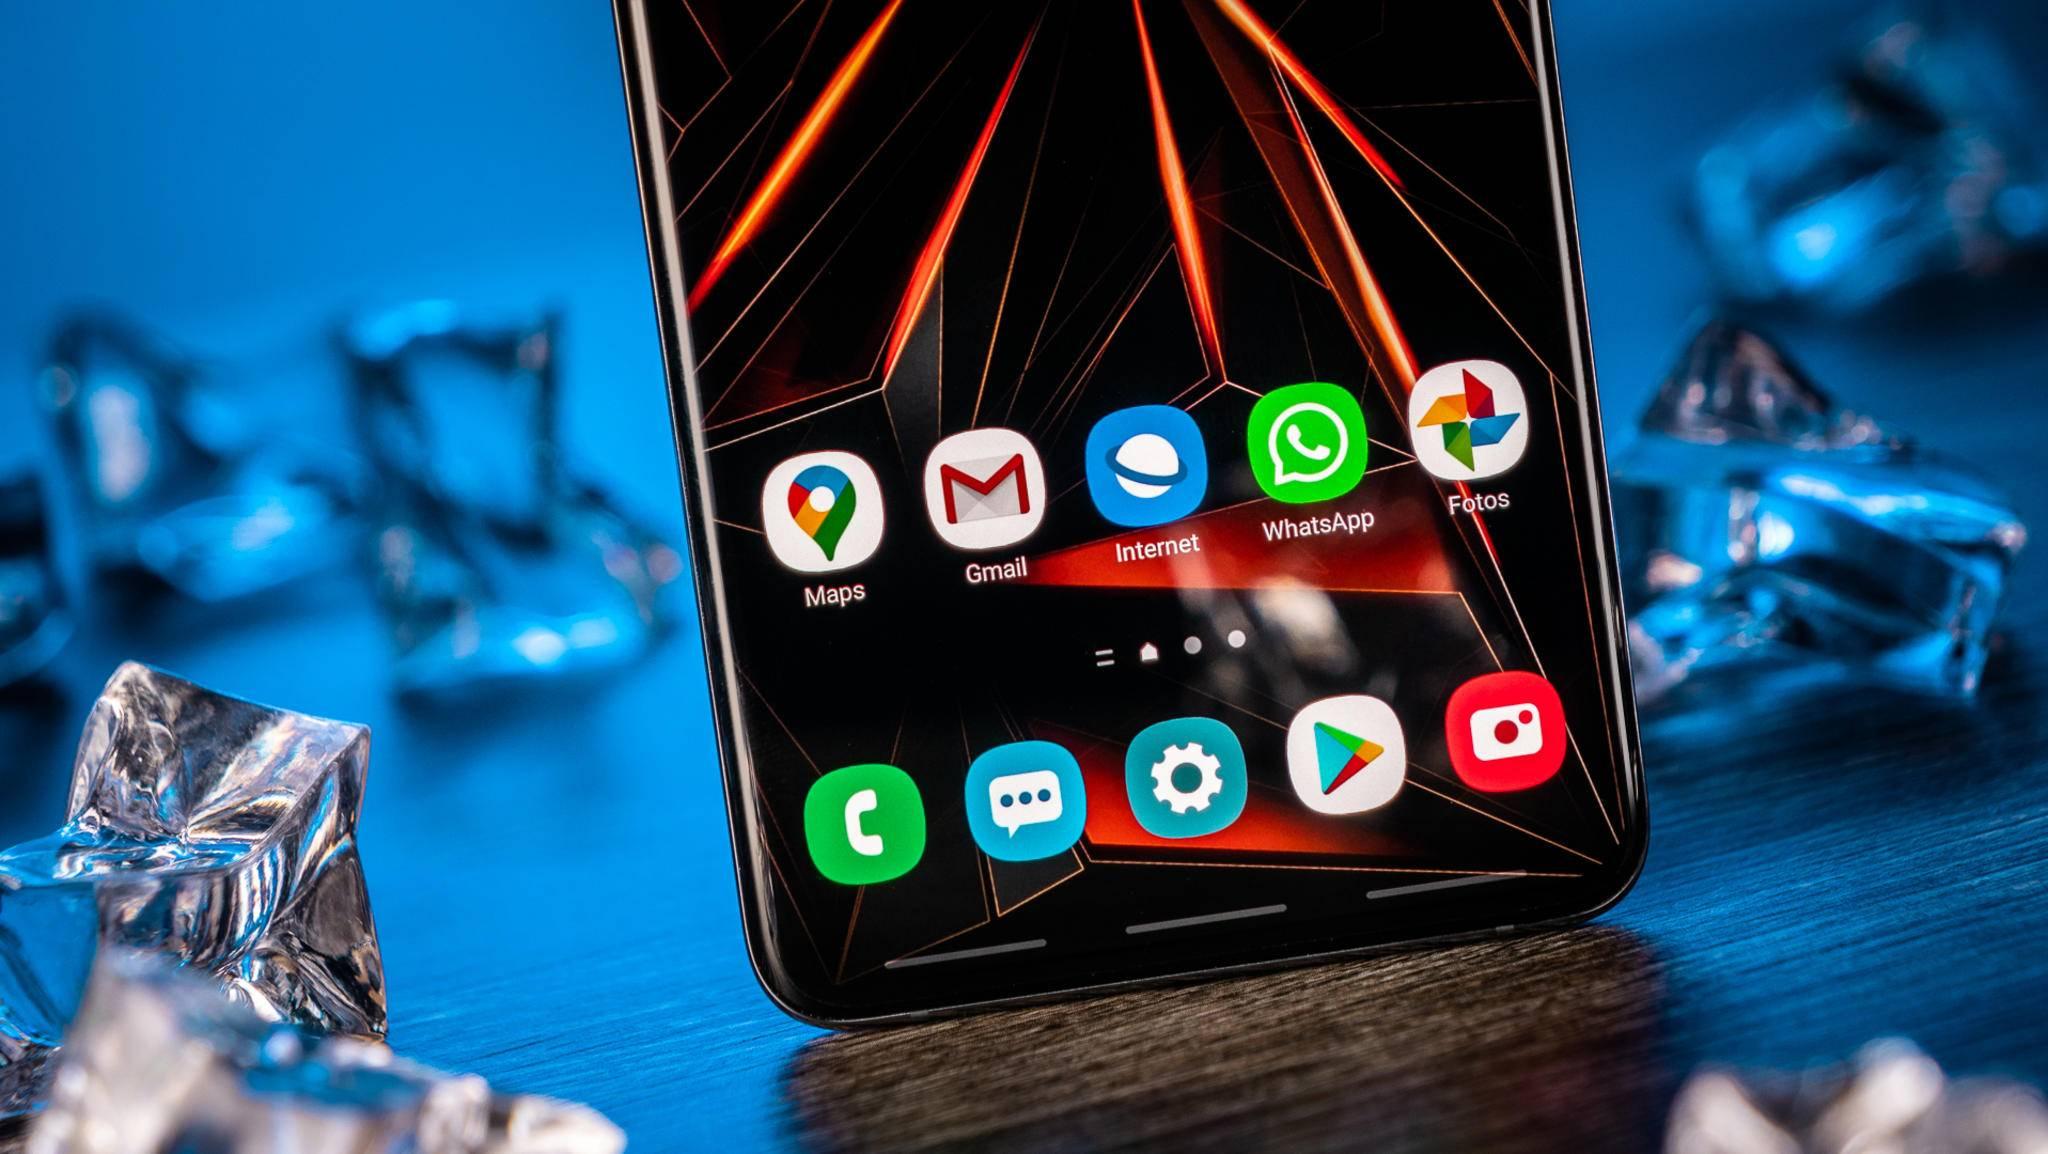 Samsung-Galaxy-S20-Plus-10